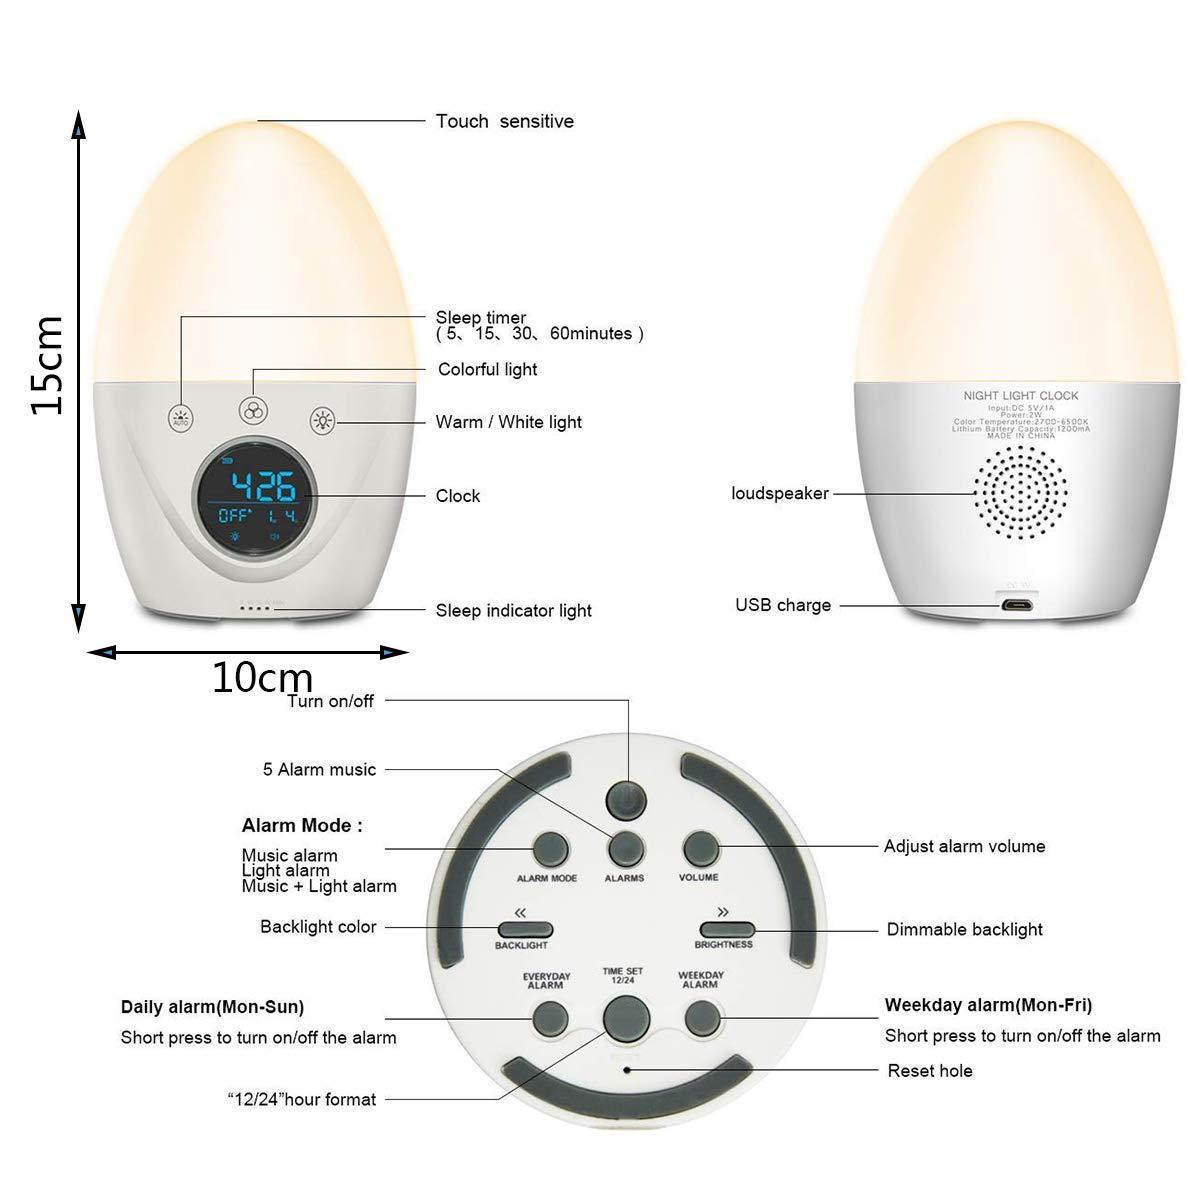 Luces-despertador Niños Lámpara Amanecer Despertador Luz Wake Up Light Reloj Digital, LED Nocturna Y Regulable Control Táctil Dormitorio Mesilla Lámpara ...